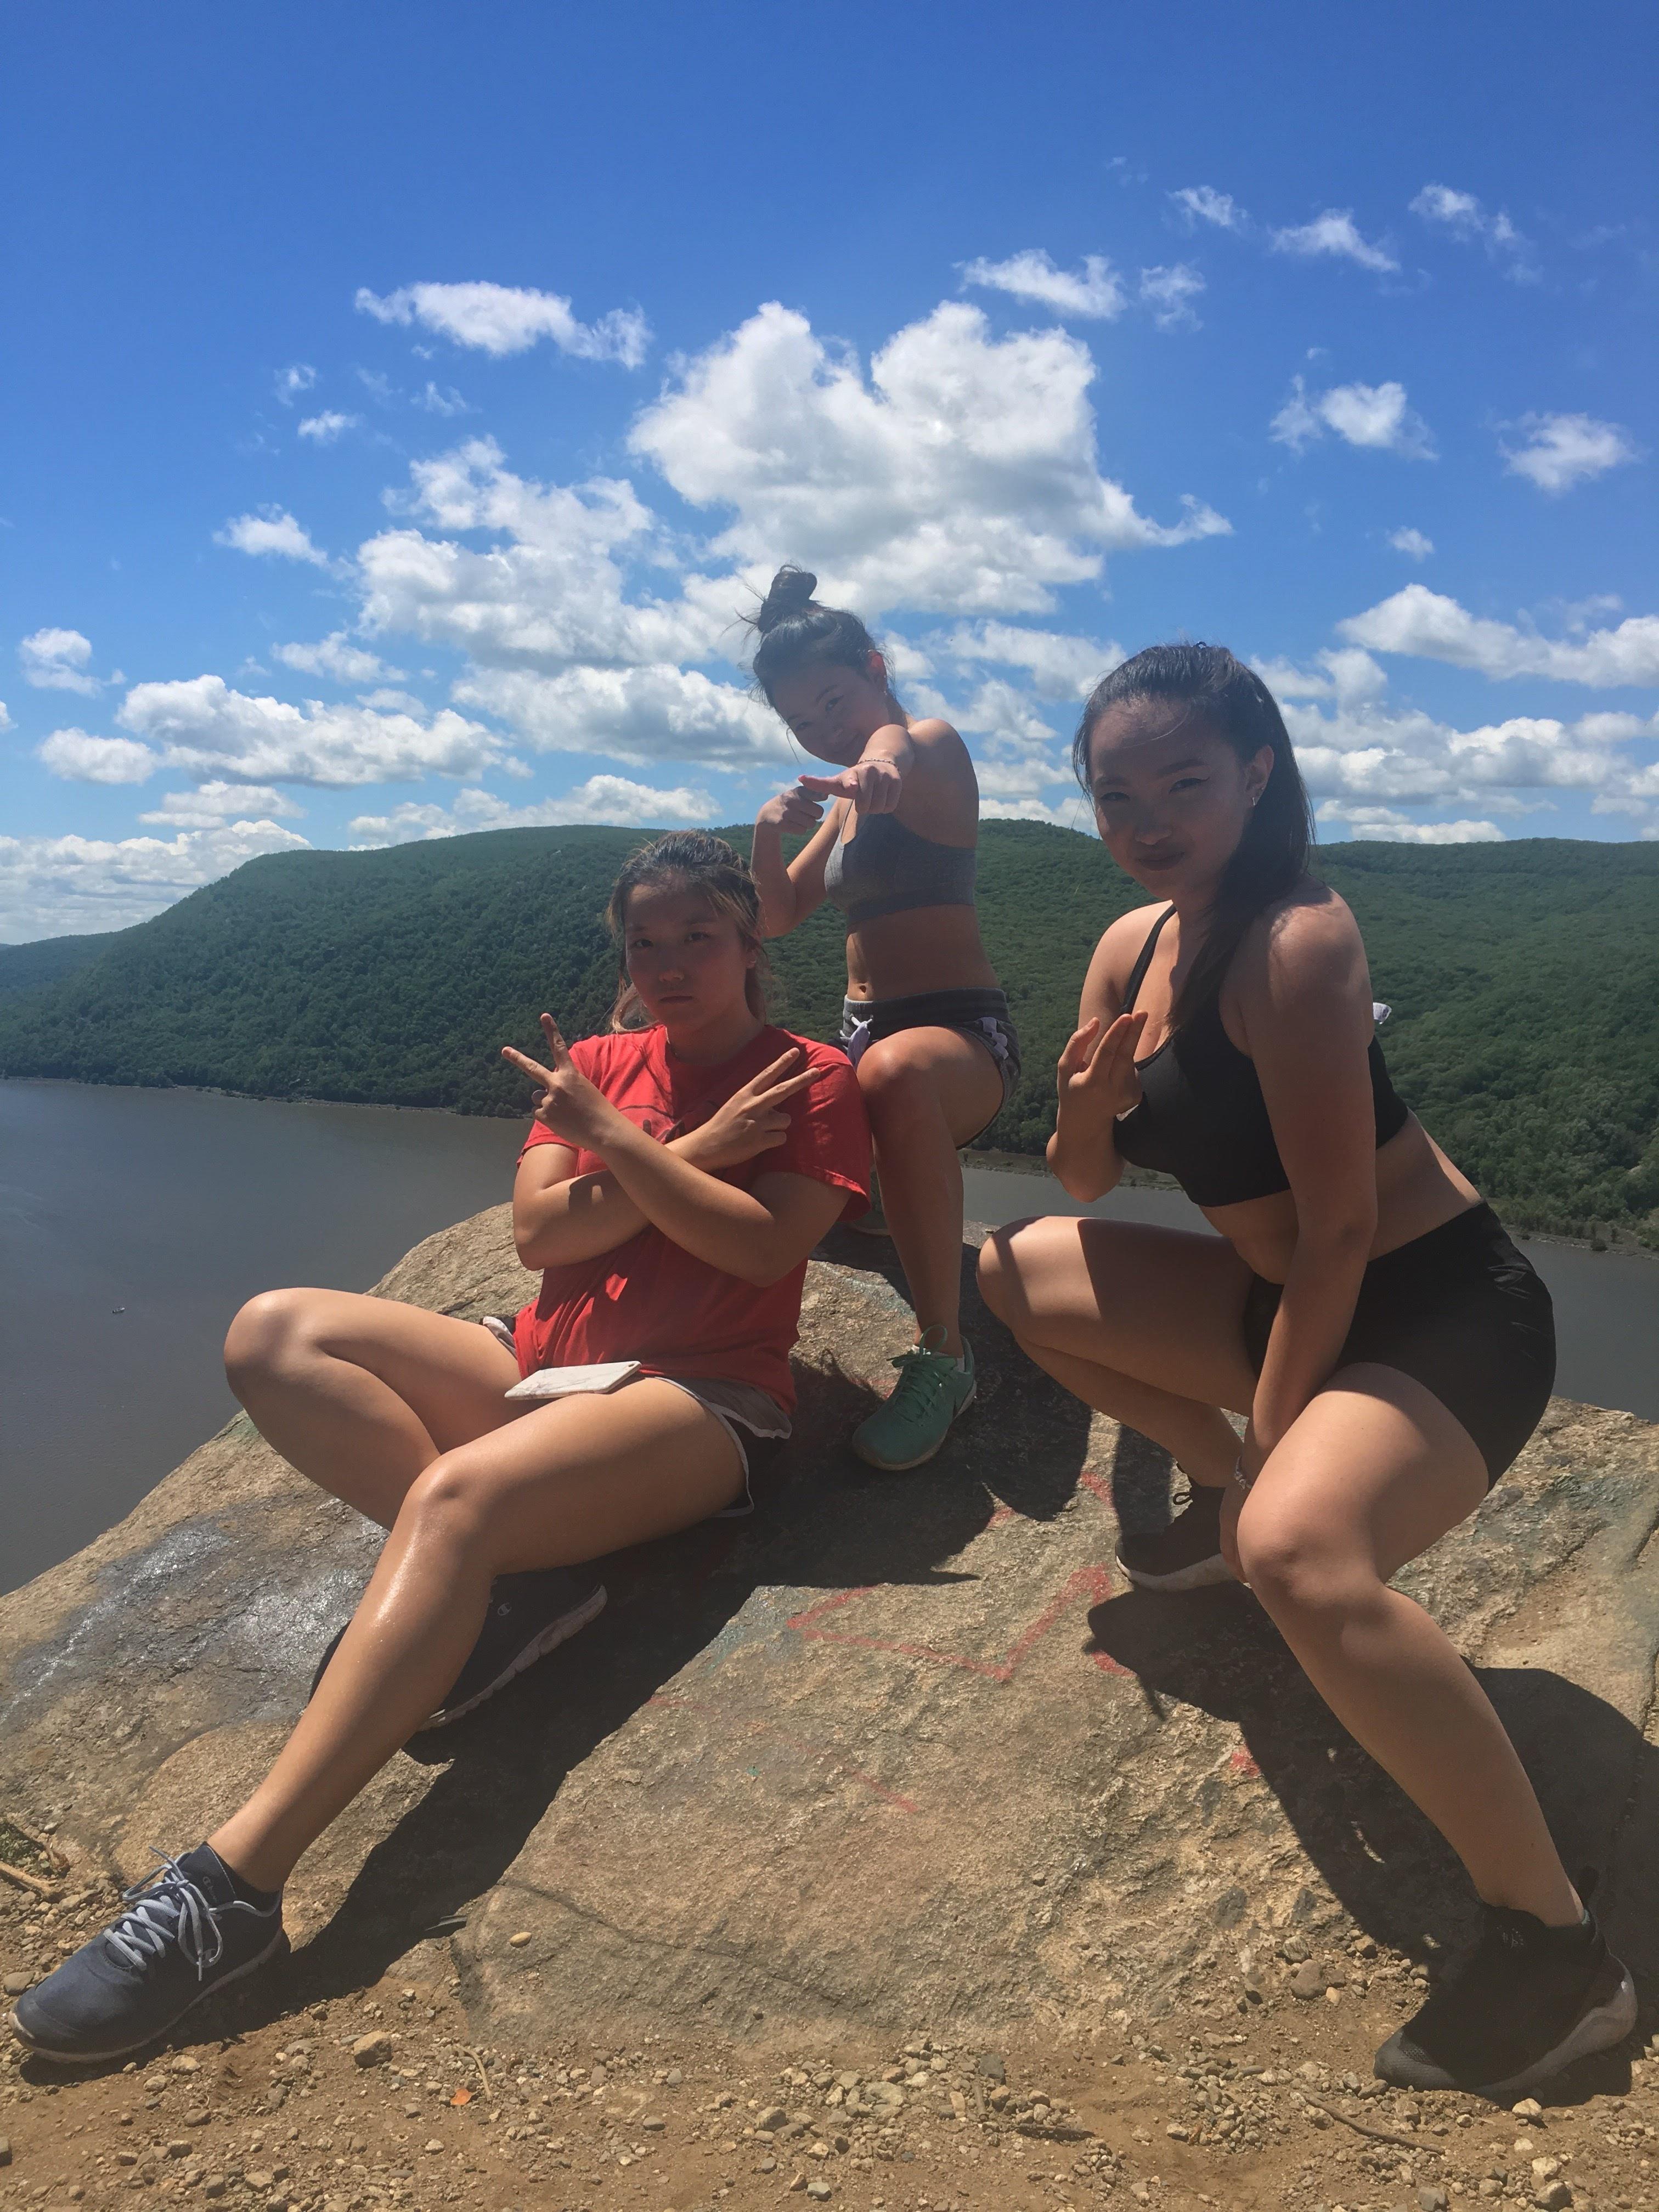 It's hiking season!